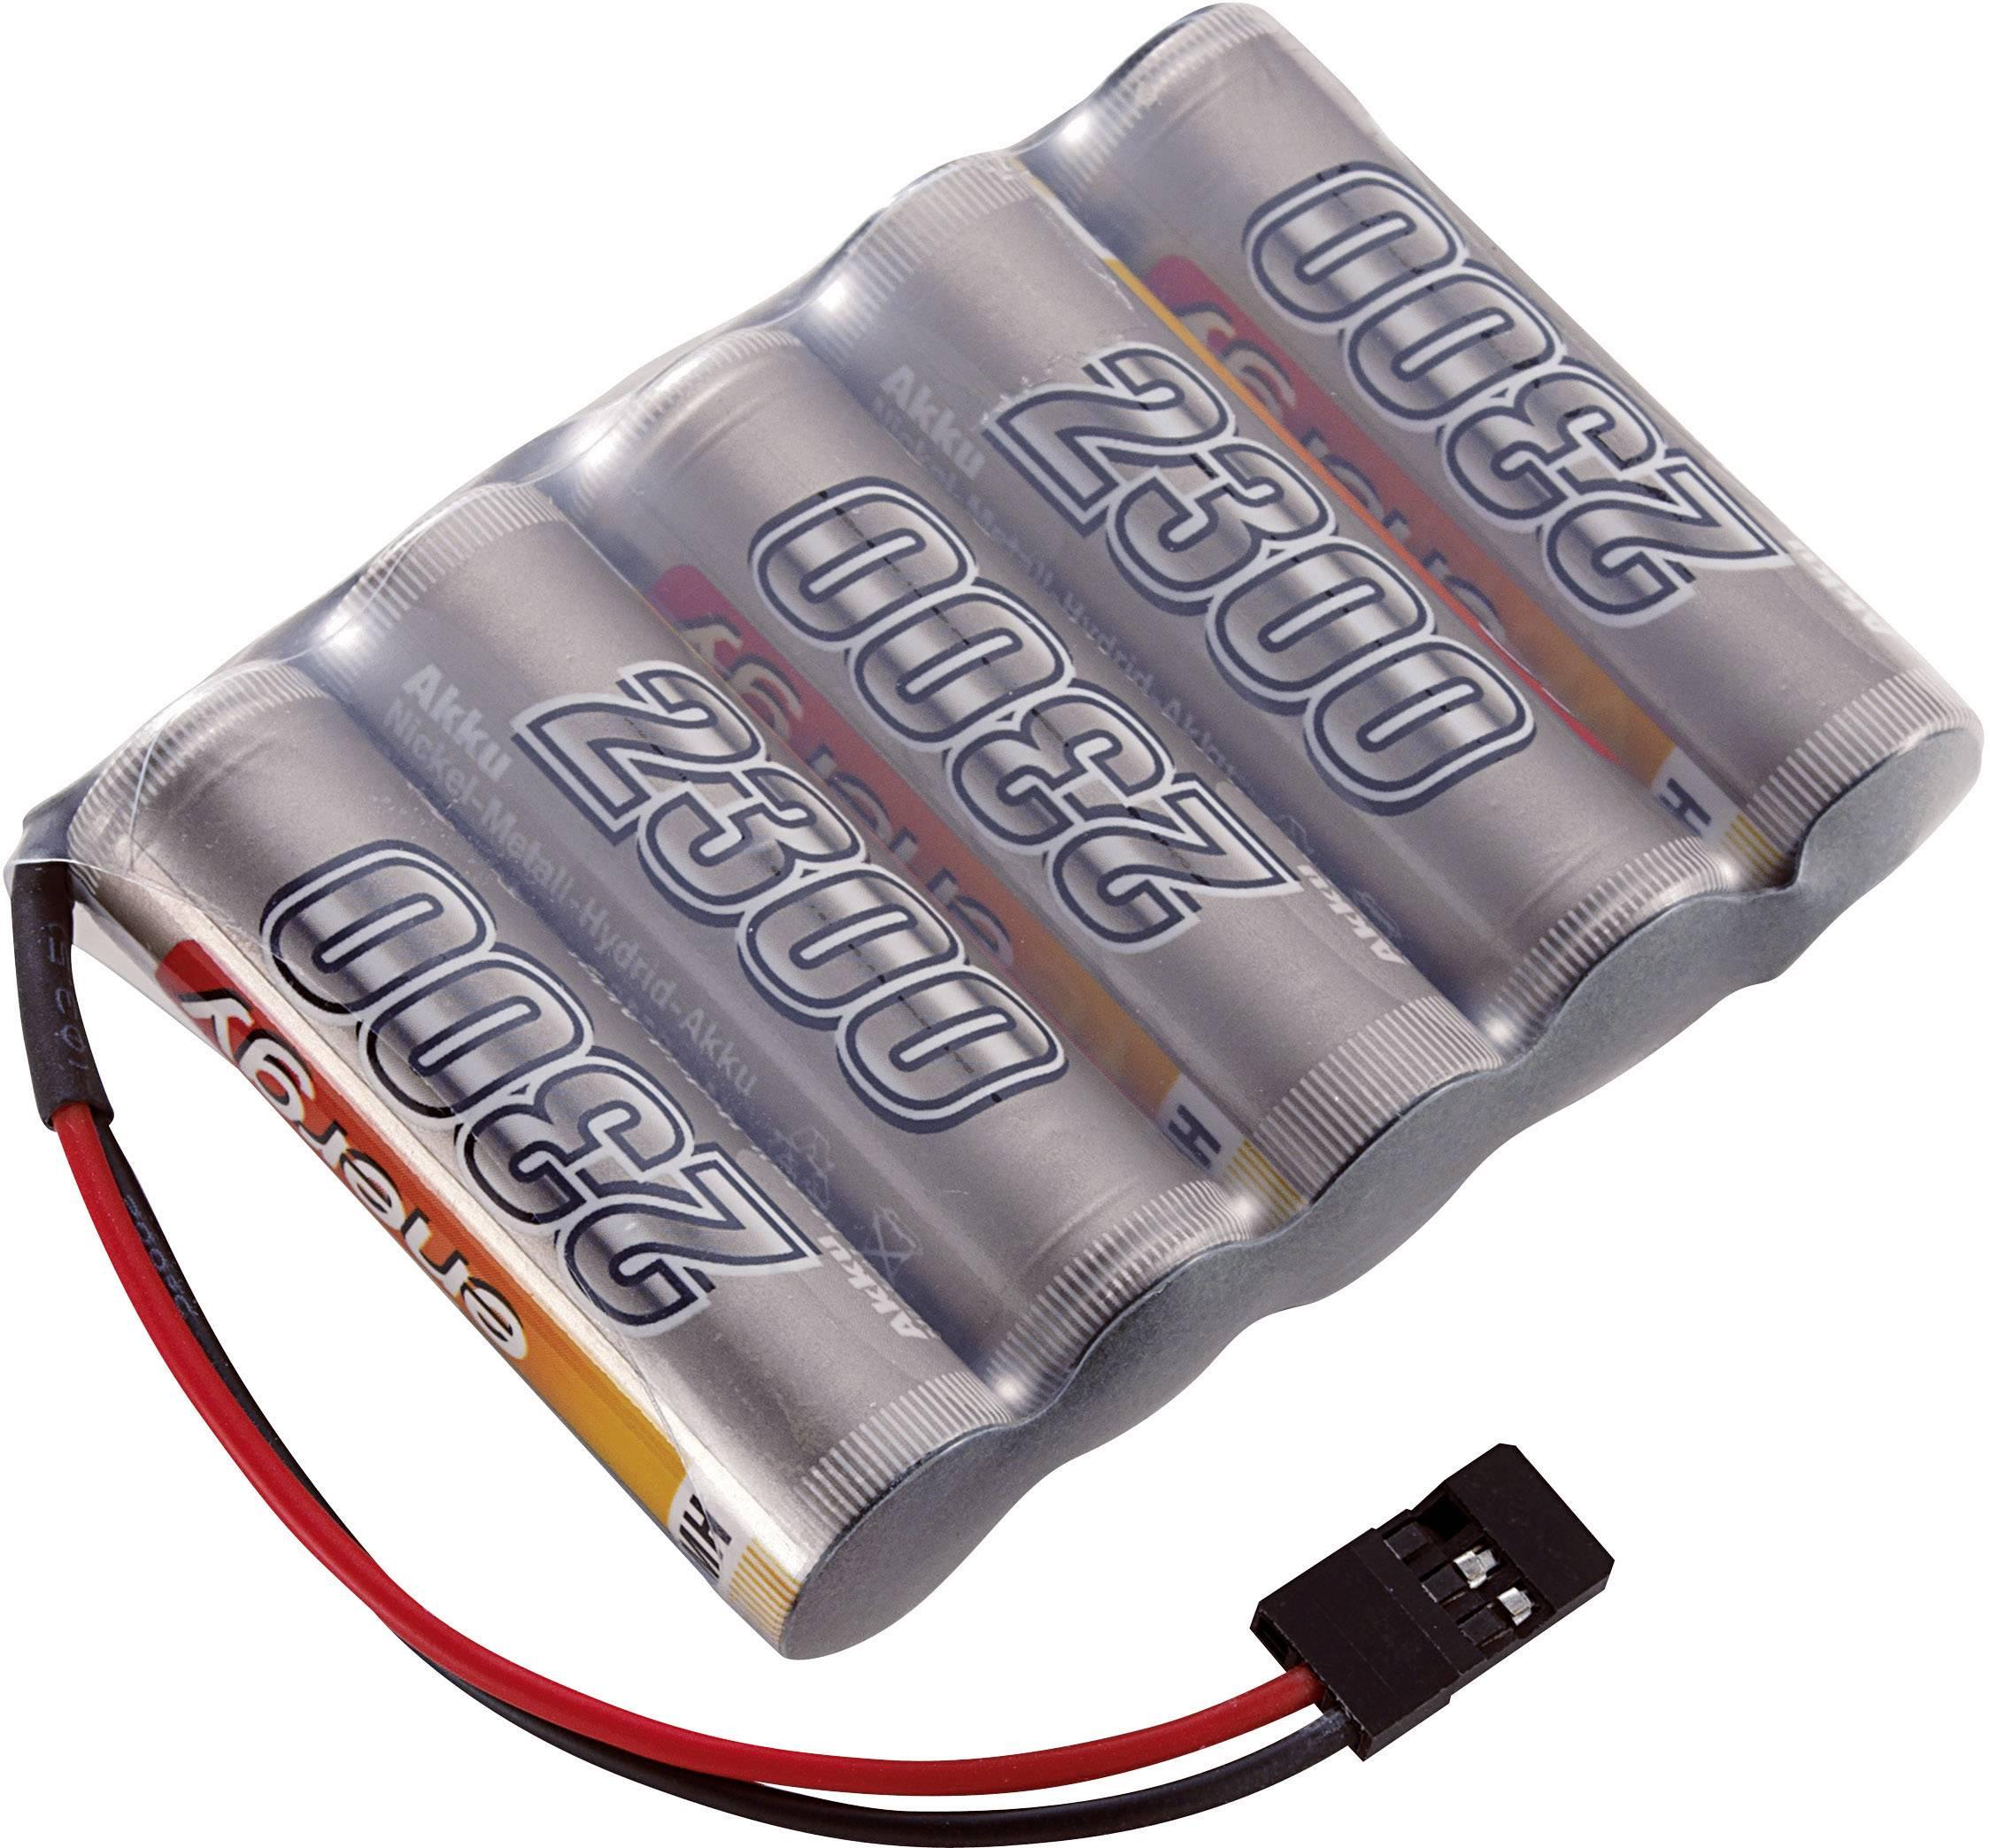 Akupack přijímače NiMH Conrad Energy AA, 6 V, 2300 mAh, Side by Side, JR